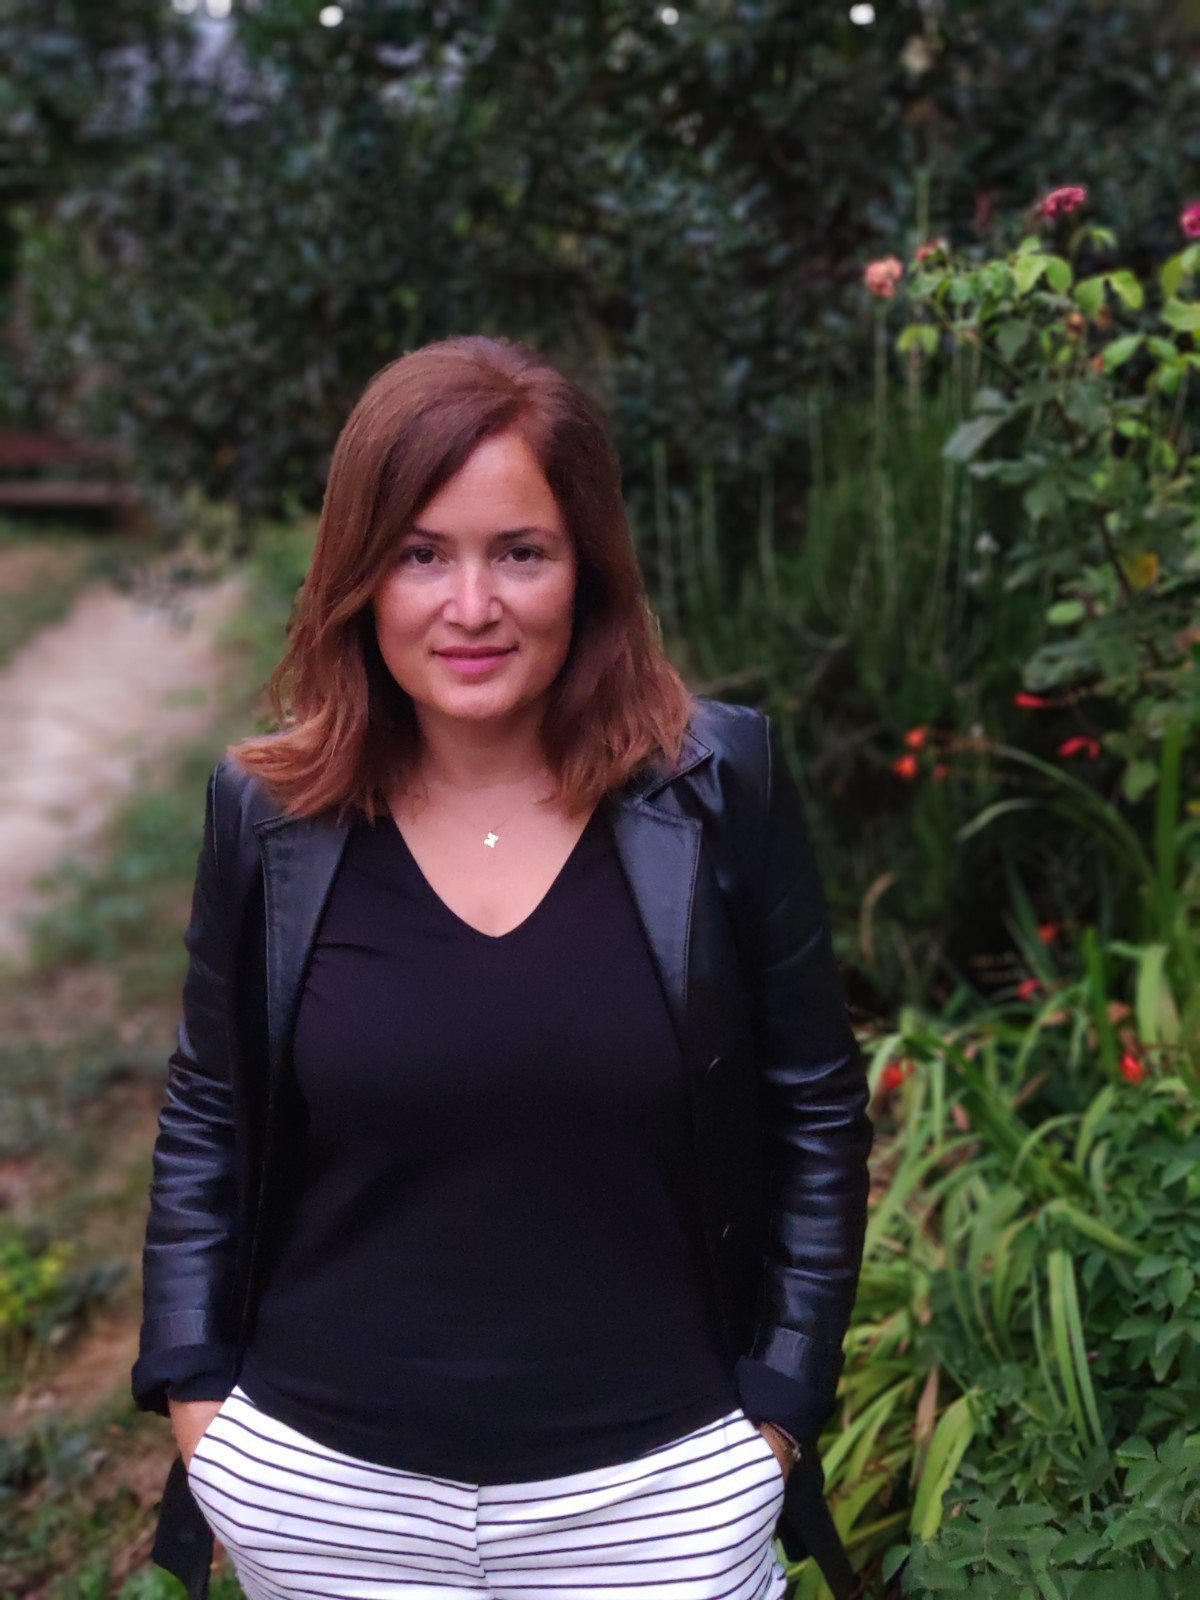 La lucha contra la polilla guatemalteca de la patata en Asturias evoluciona favorablemente